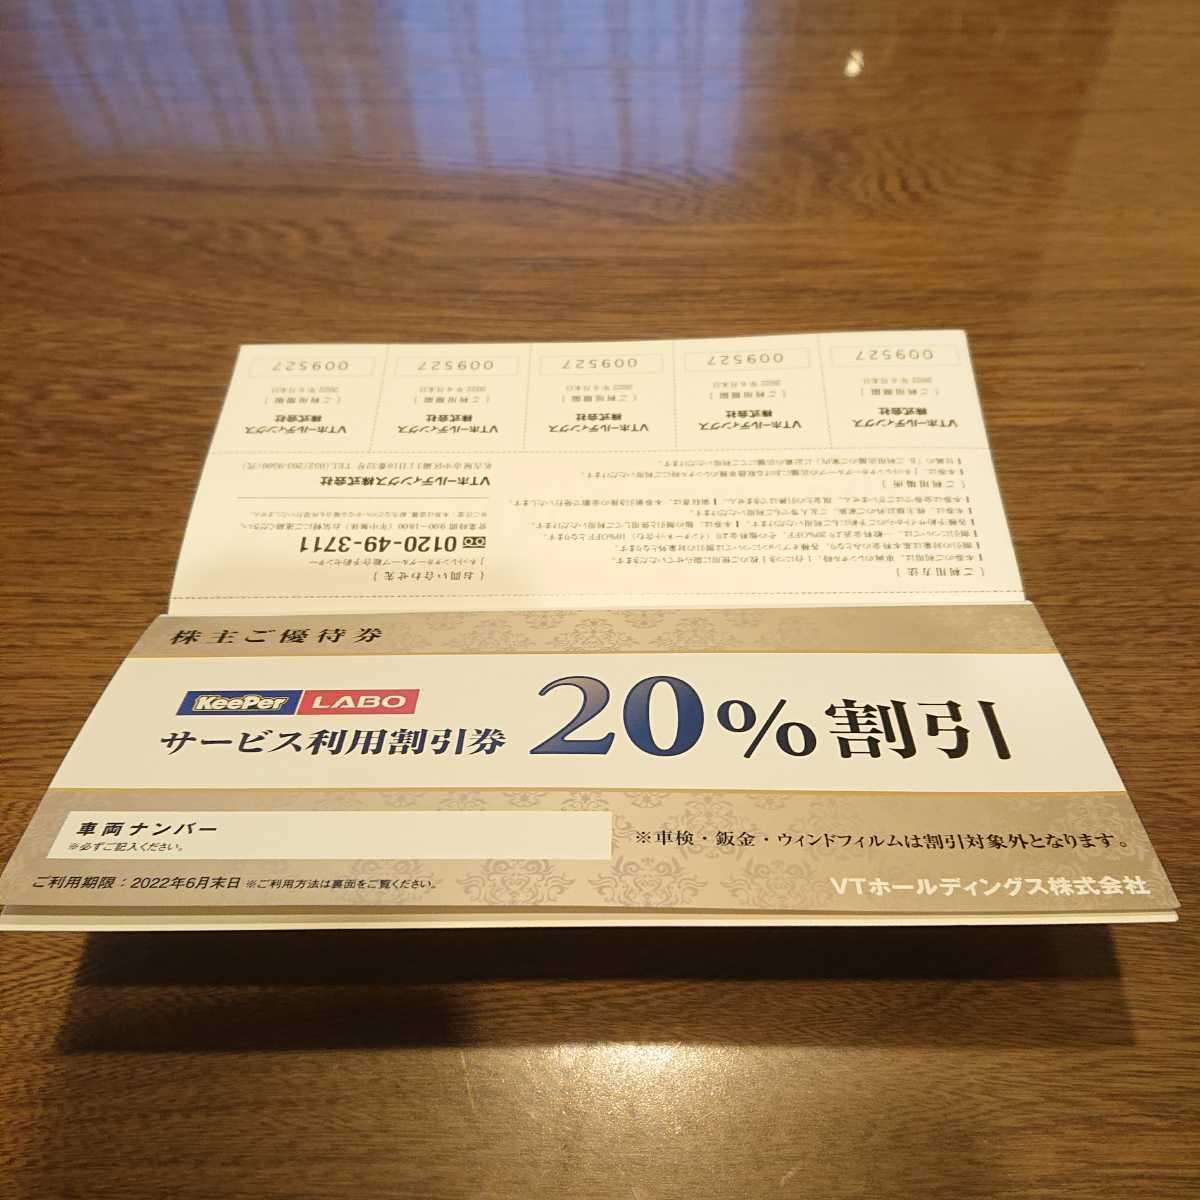 VTホールディングス株主優待 KeePer LABO20%割引券など (1冊:未使用)_画像2